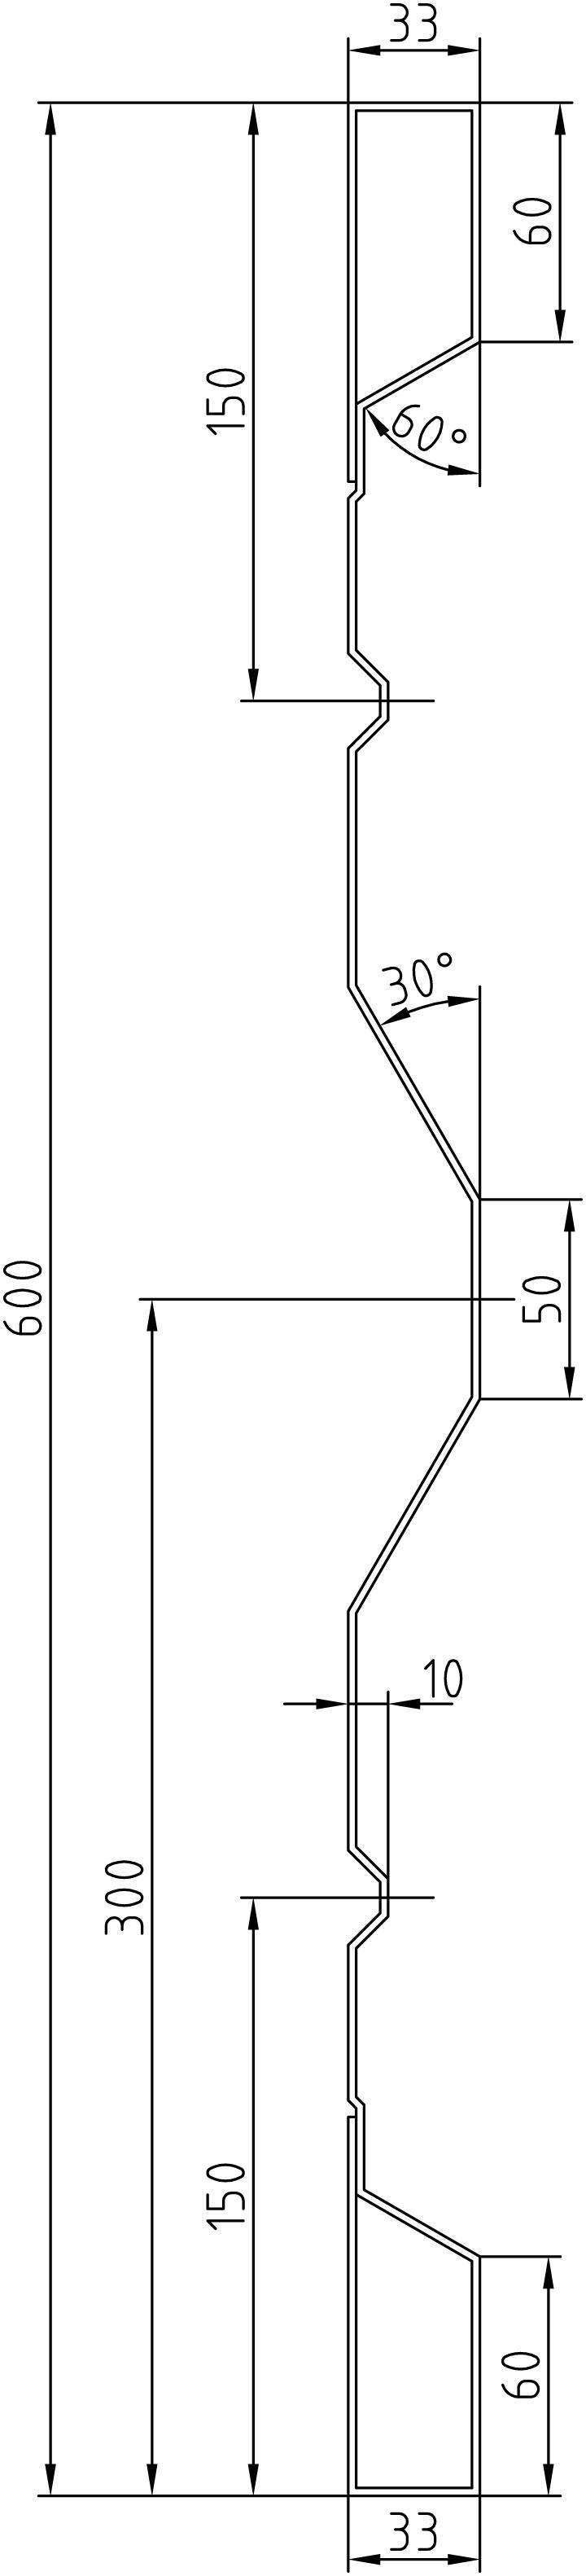 Brantner Kipper und Anhänger - SmE HV 600x2 2238 trailing edge 40/20/5